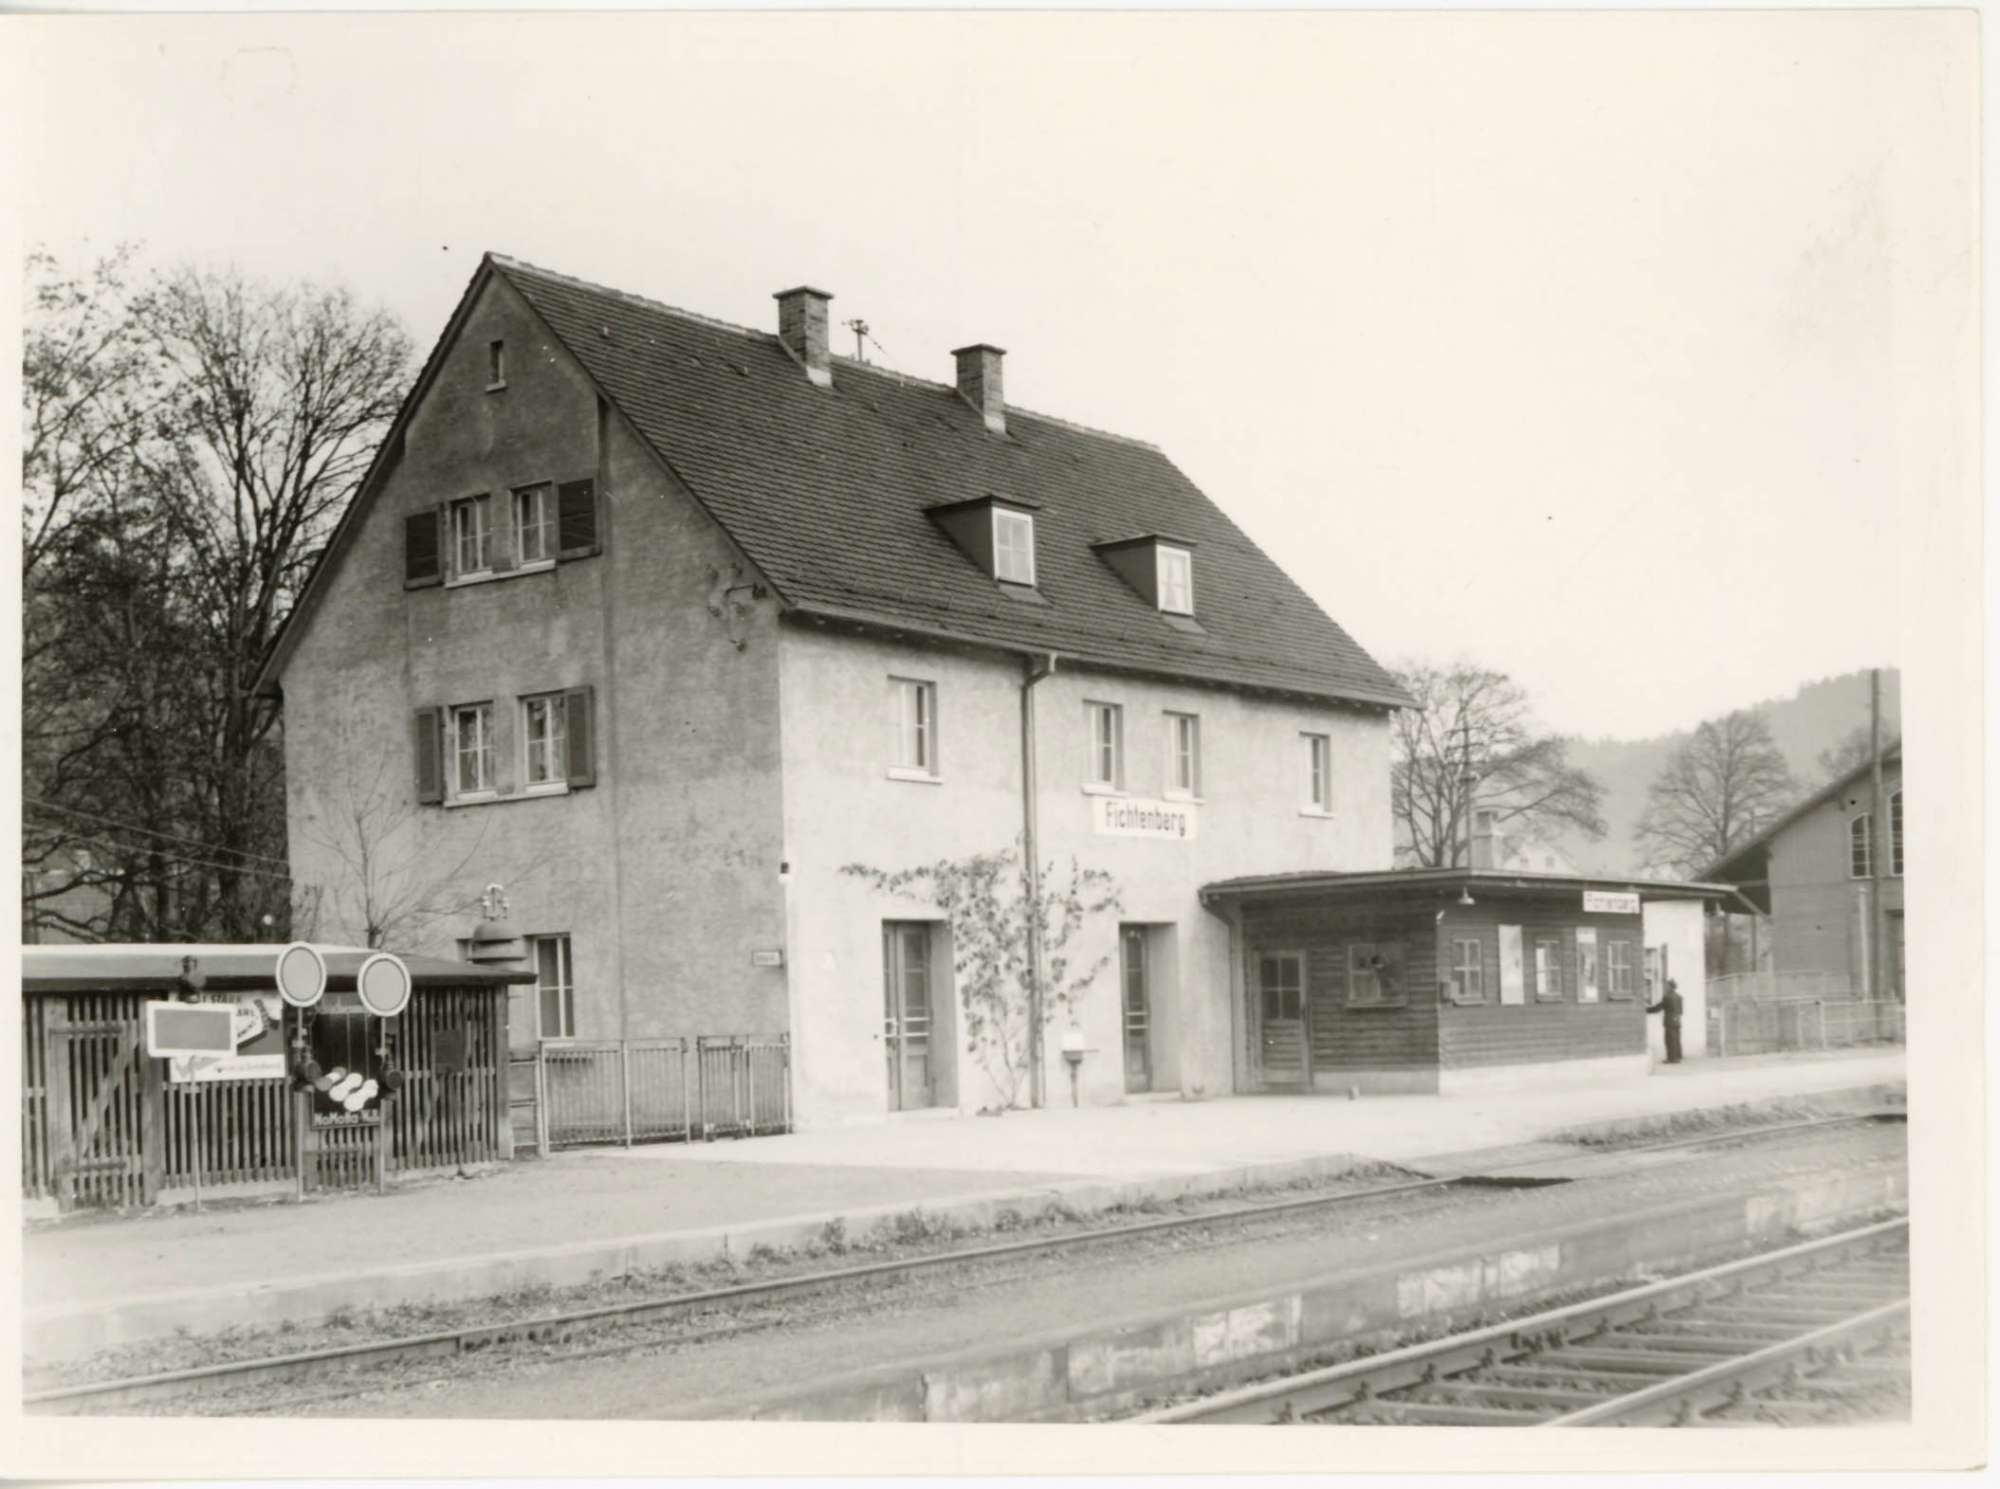 Fichtenberg: 3 Fotos u.a., Bild 3